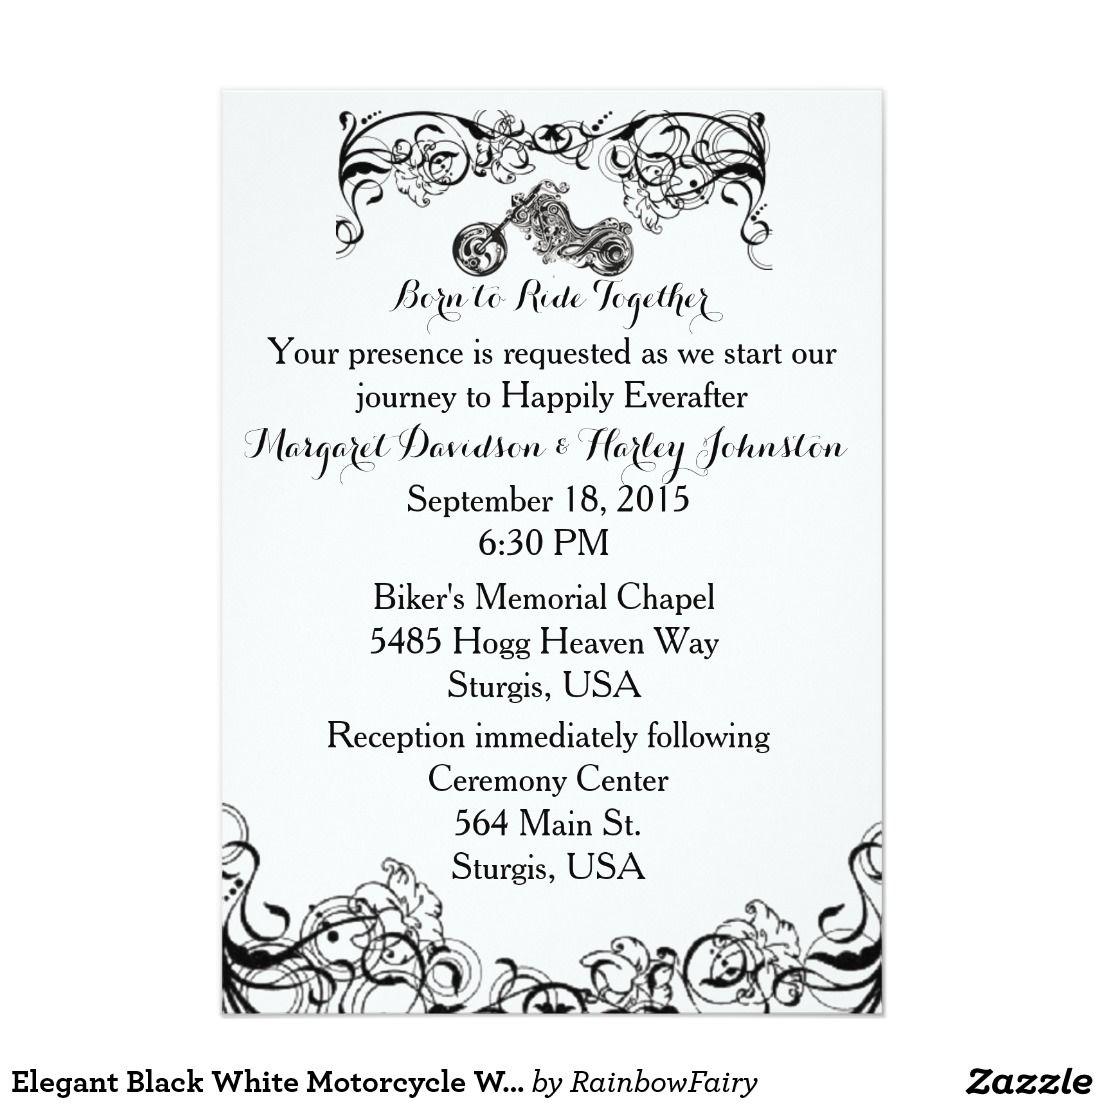 Elegant Black White Motorcycle WEDDING INVITATION   Weddings, Black ...